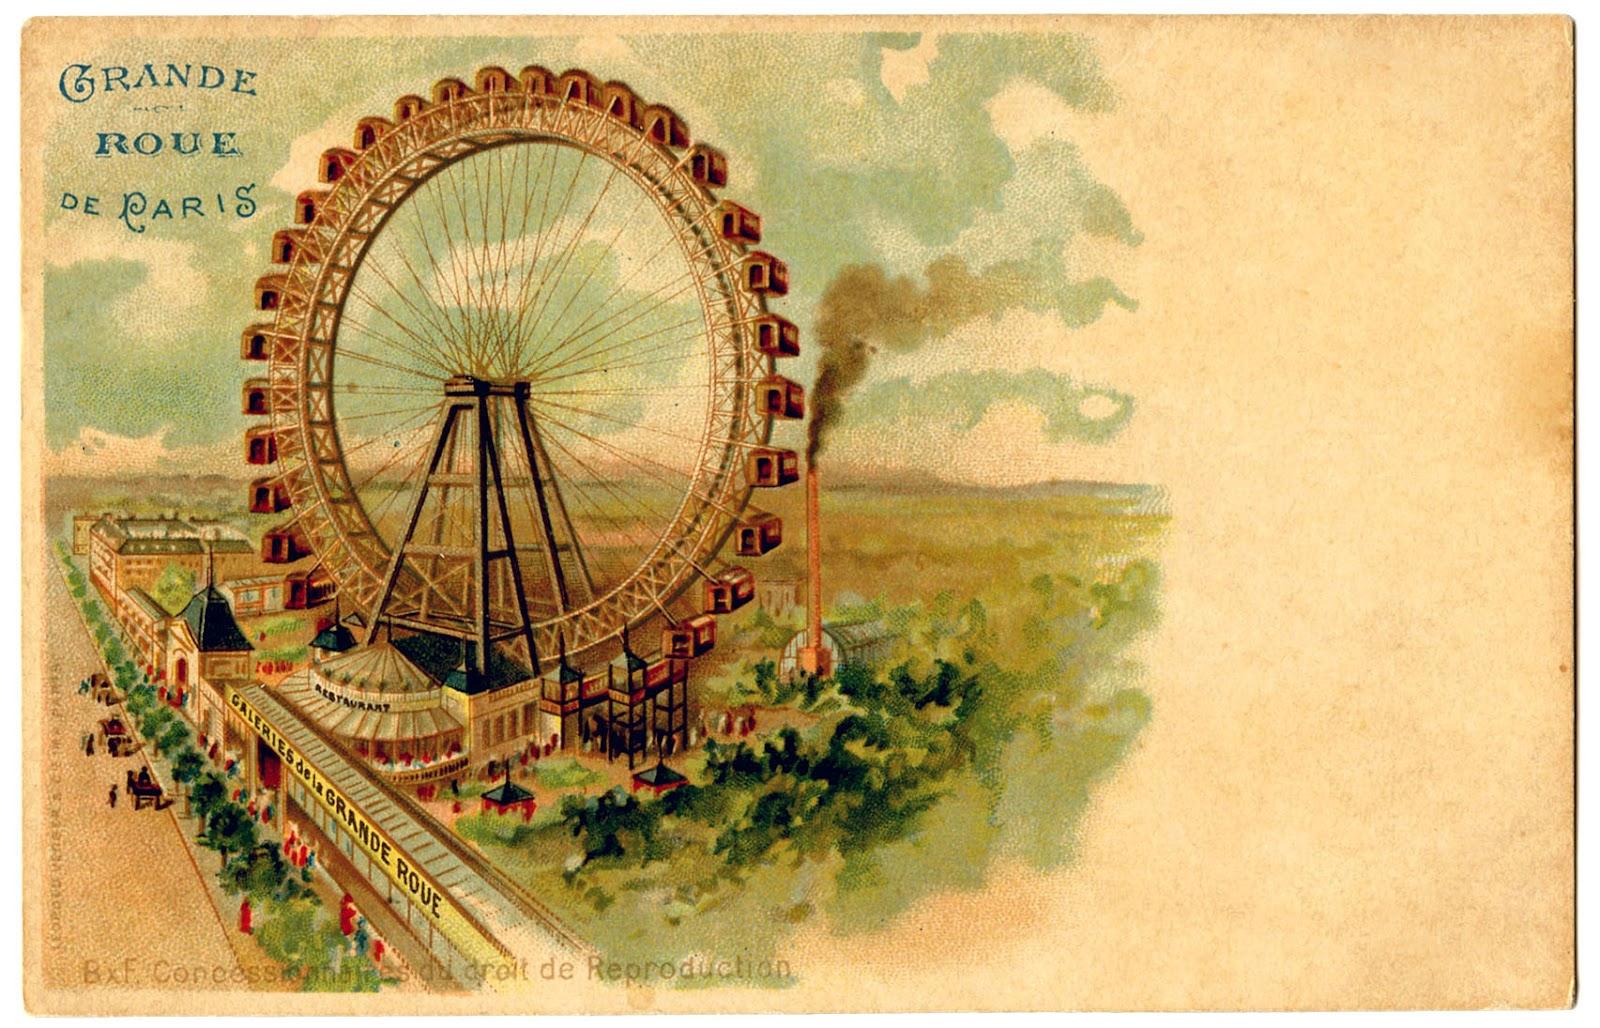 Vintage Graphic - Paris Ferris Wheel - The Graphics Fairy